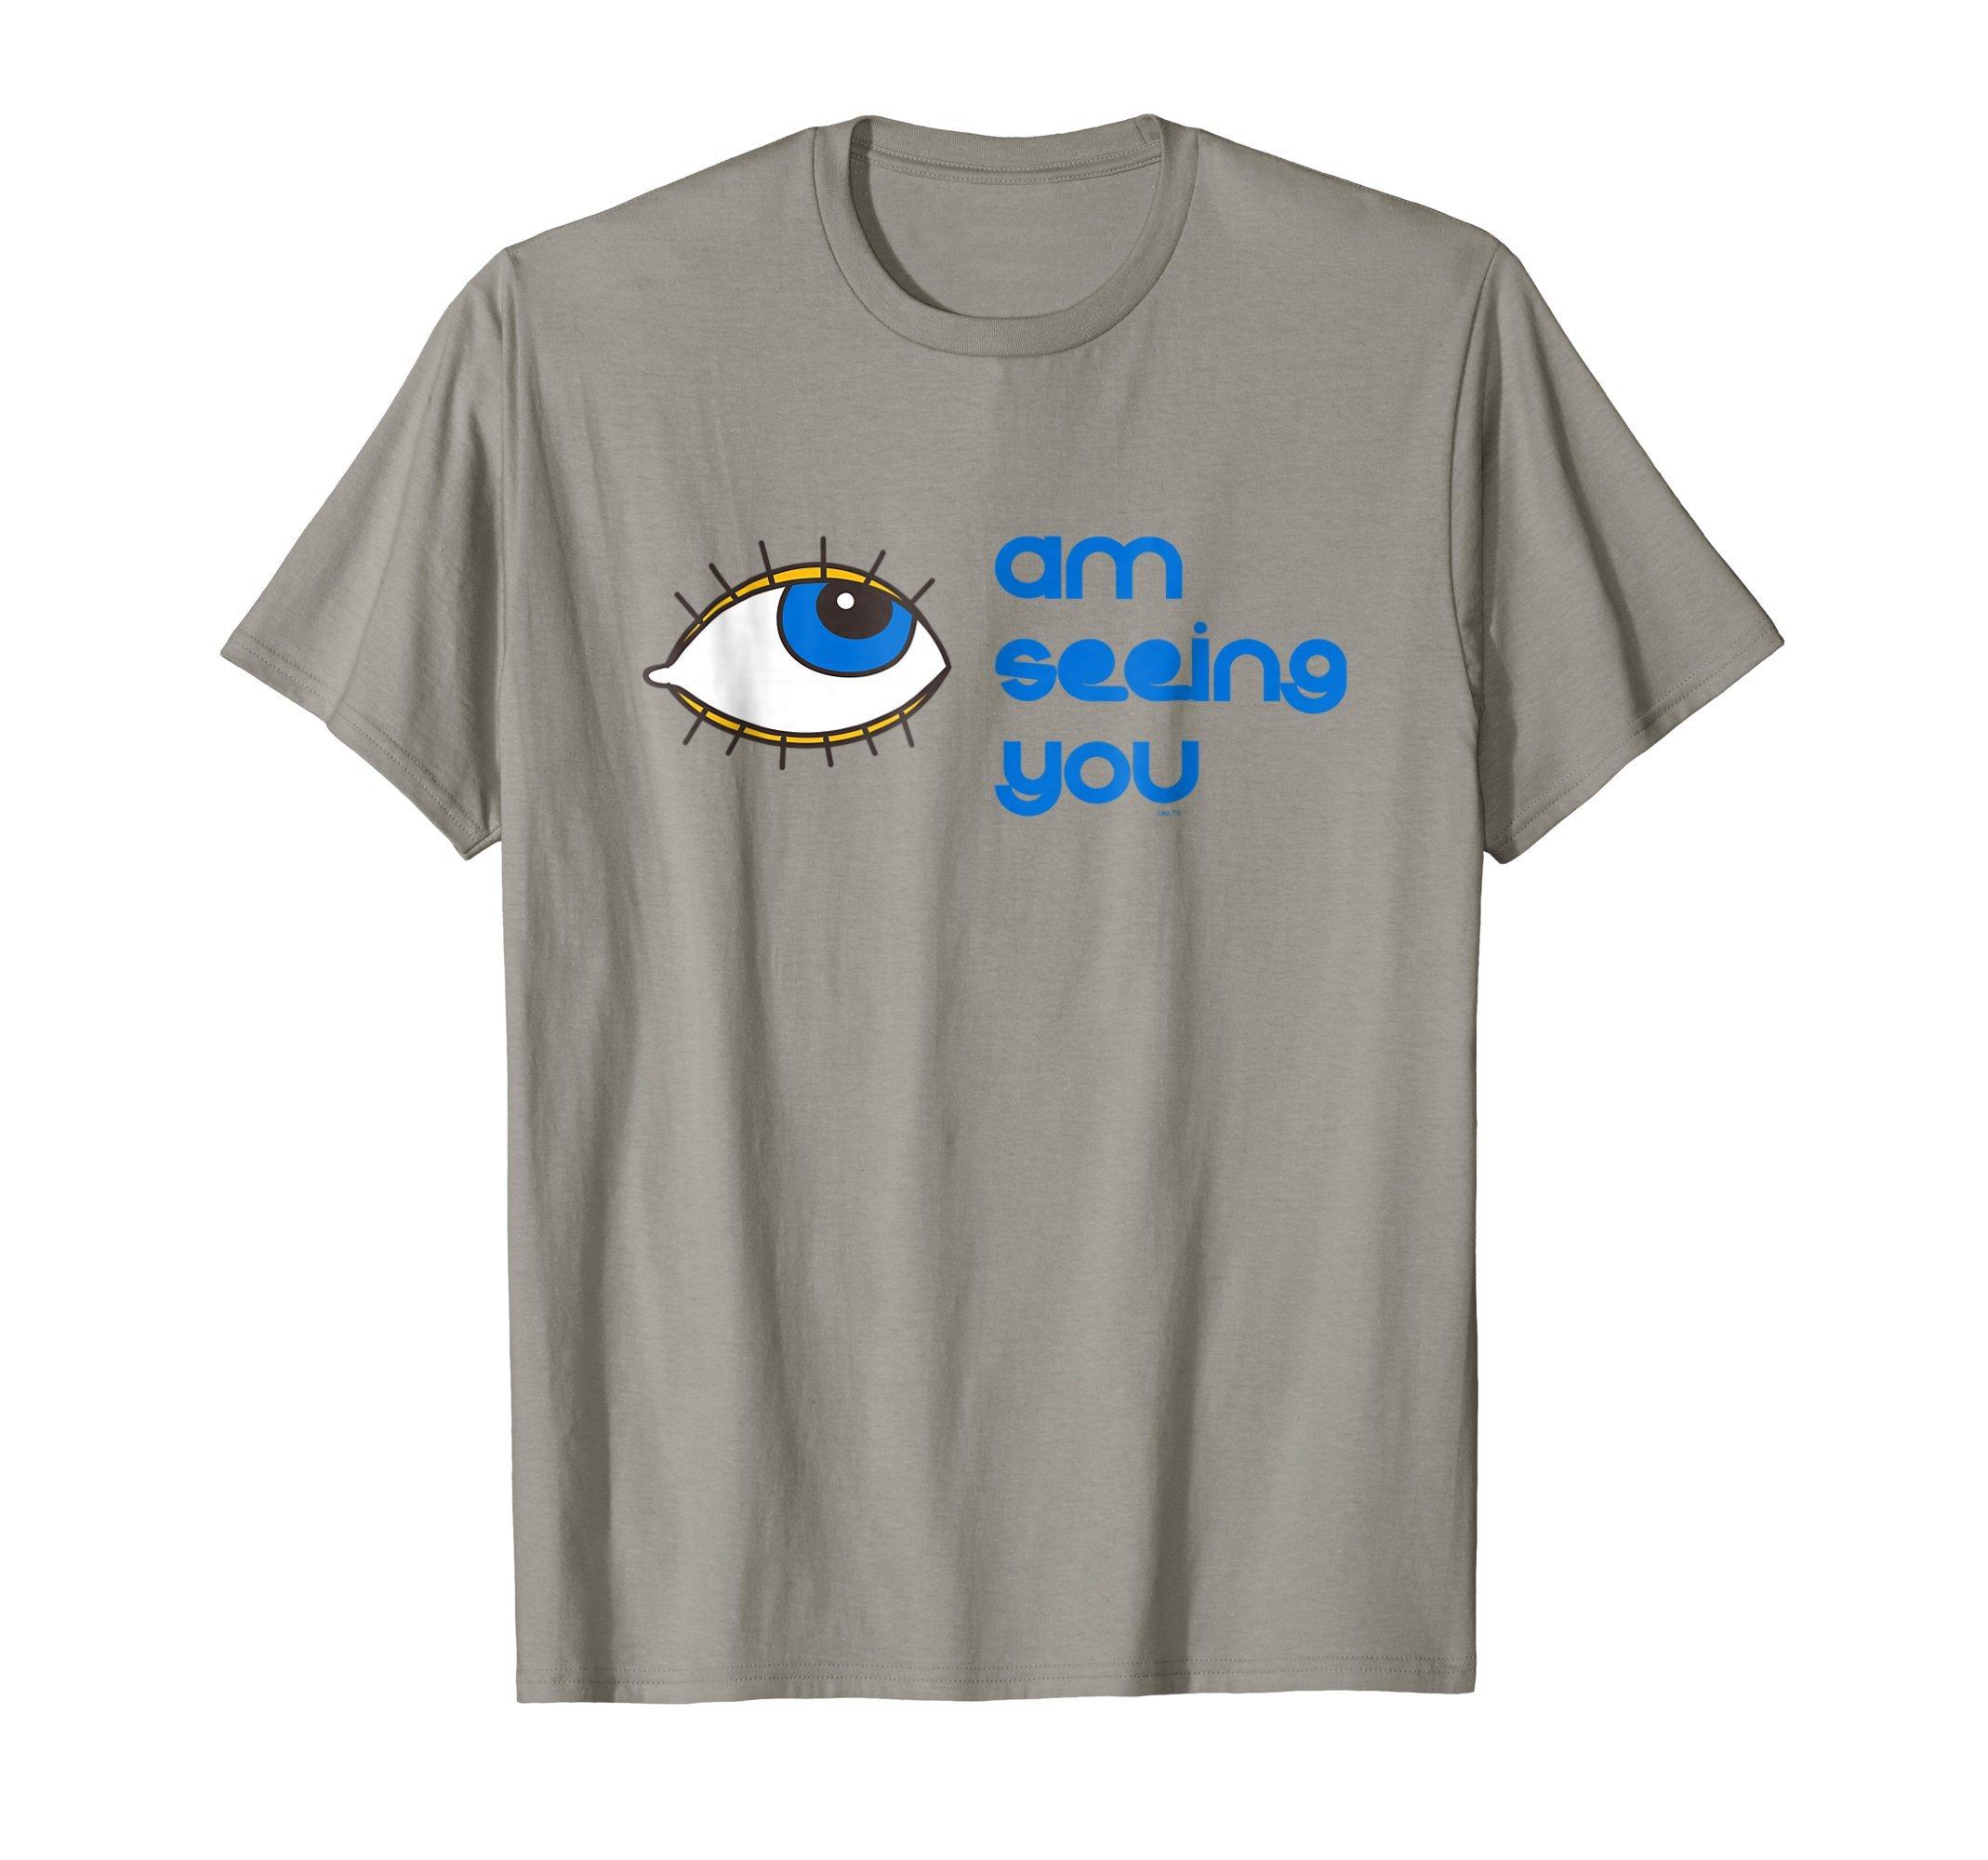 I-am-Seeing-You-Funny-Humor-T-Shirt-Tee-Shirt-gift